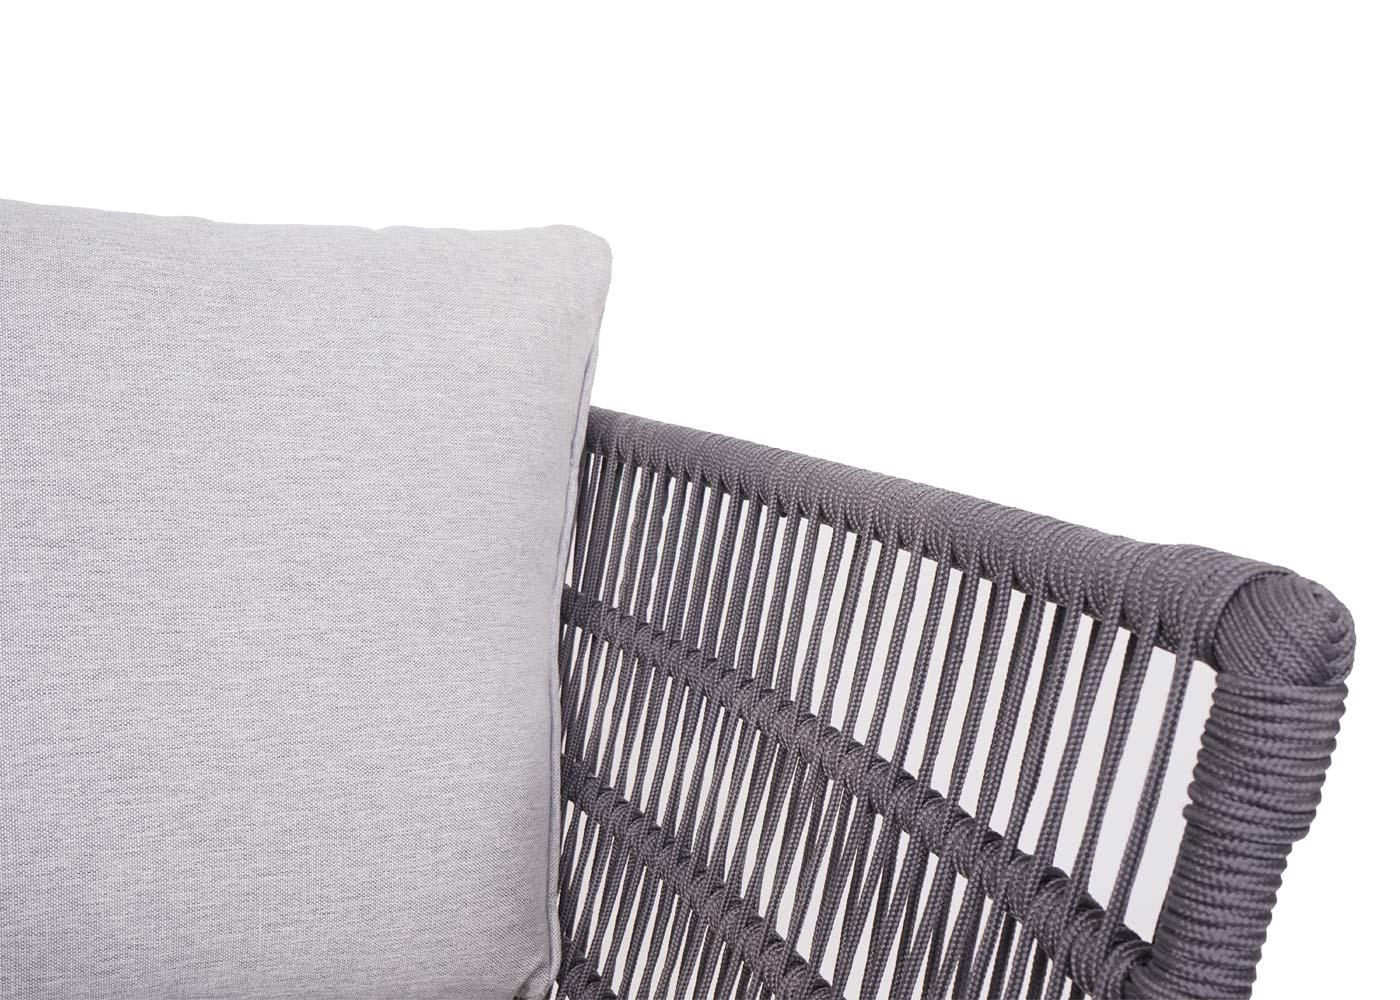 Gartengarnitur HWC-H55 Detailbild Kissen